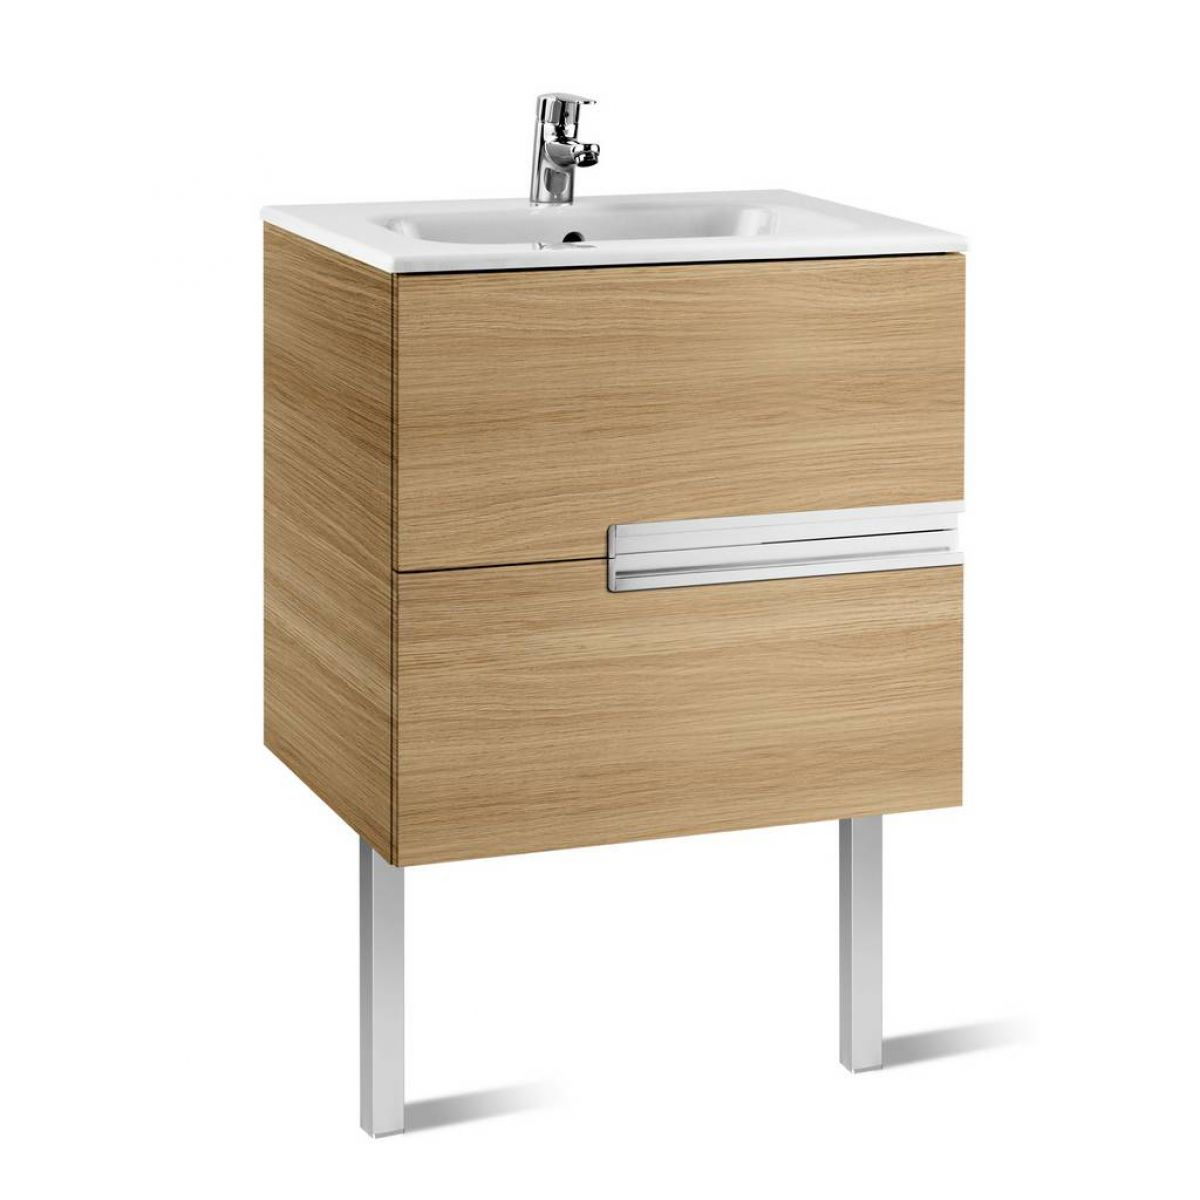 Minimalist gloss white vanity unit 600 800 or 1000mm - Roca Victoria N 2 Drawer Vanity Unit With Basin